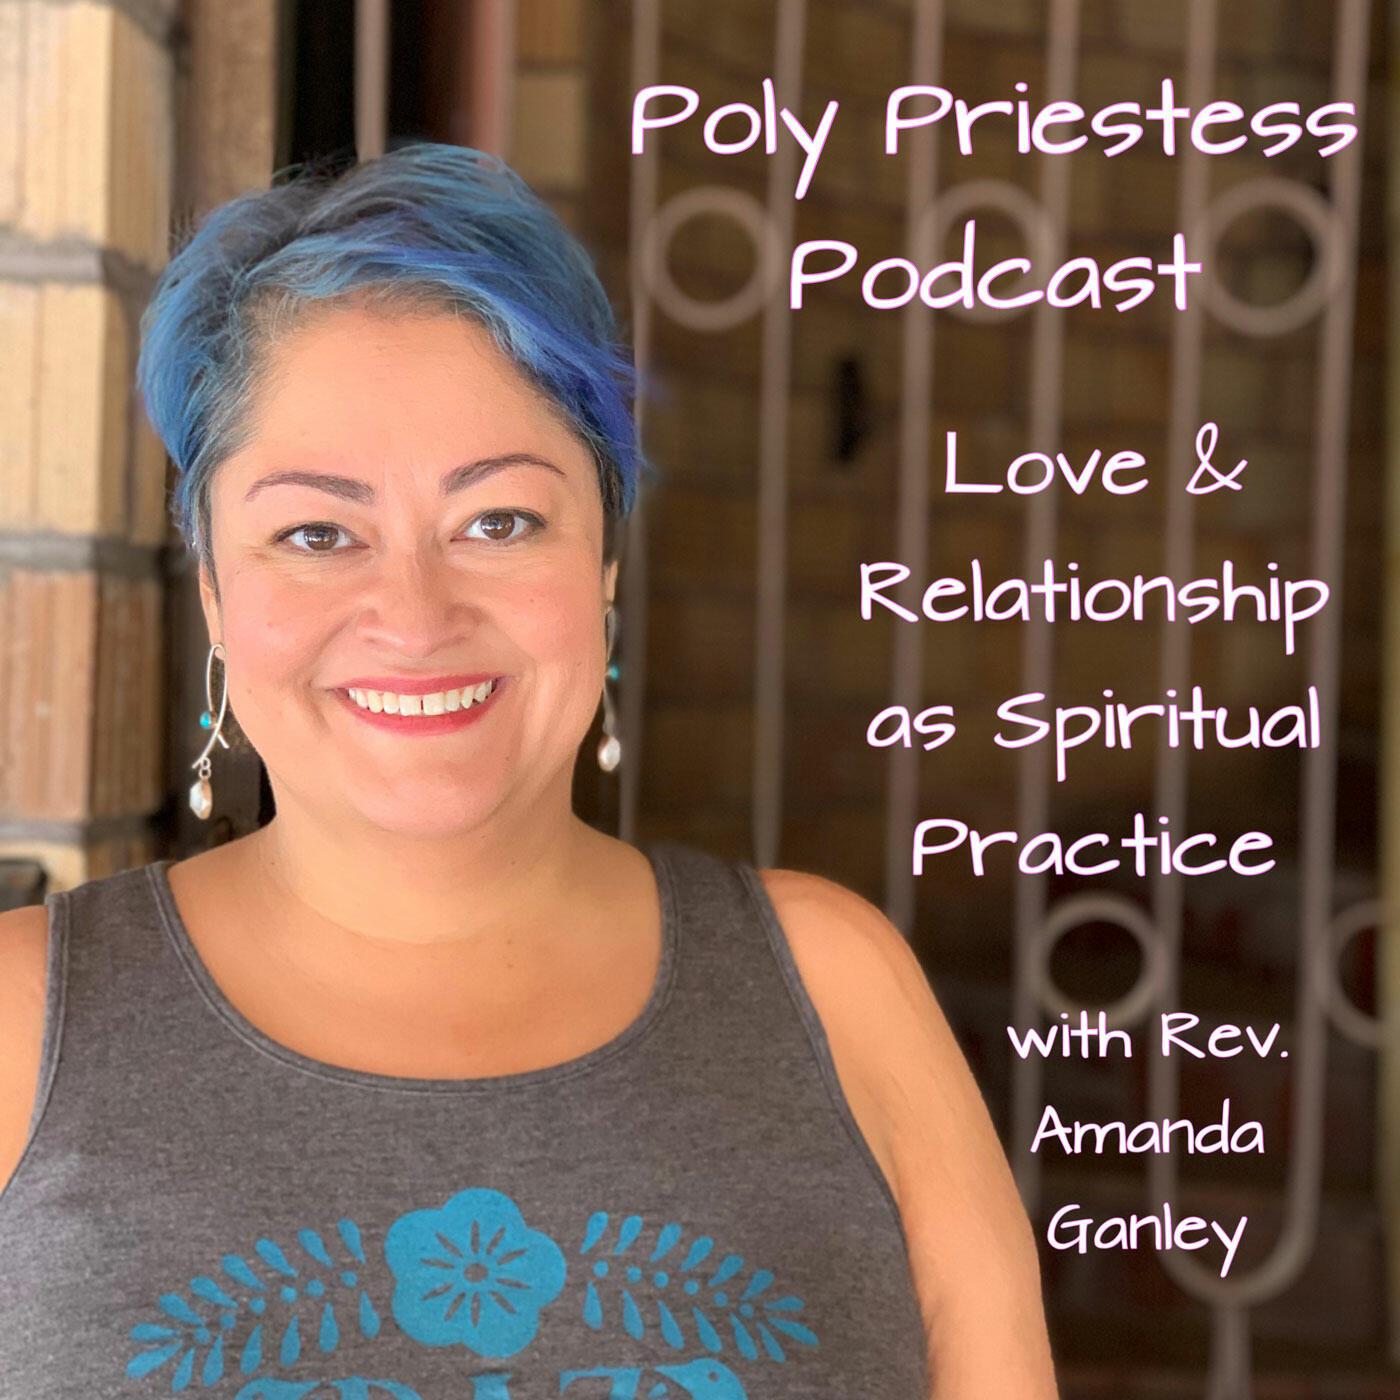 The Poly Priestess Podcast